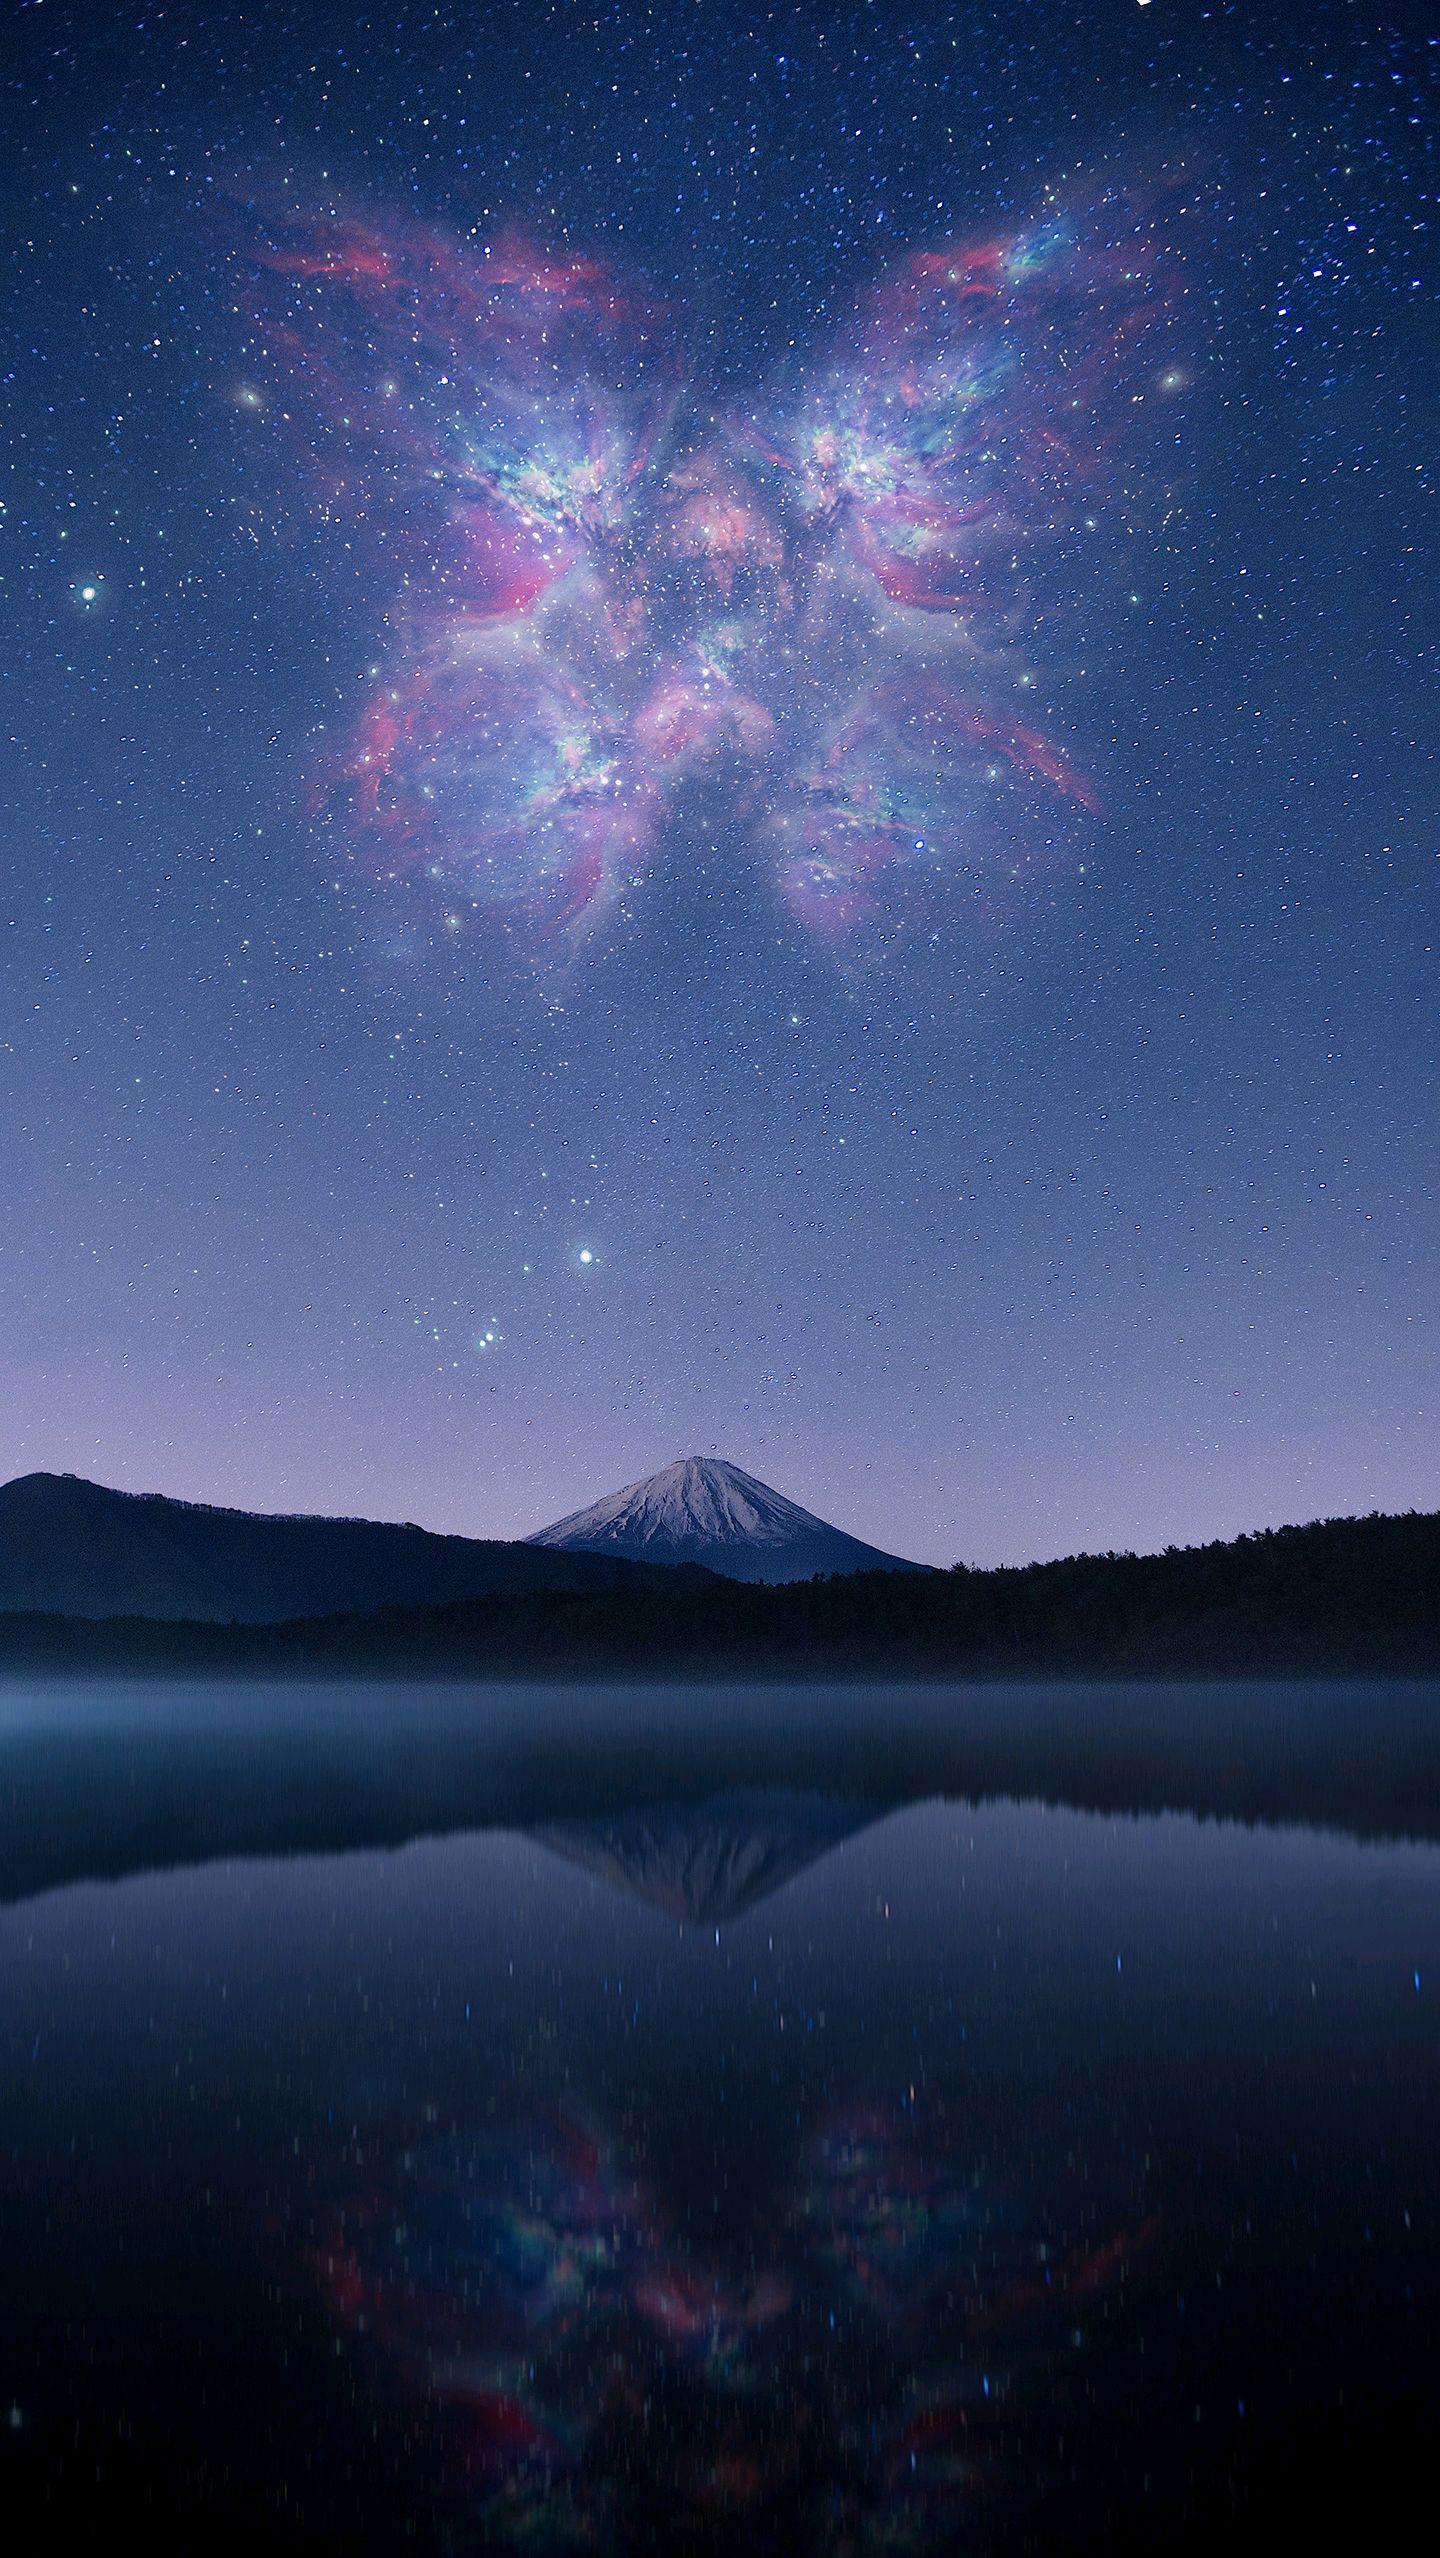 Mount Fuji Lake Night Stars iPhone Wallpaper